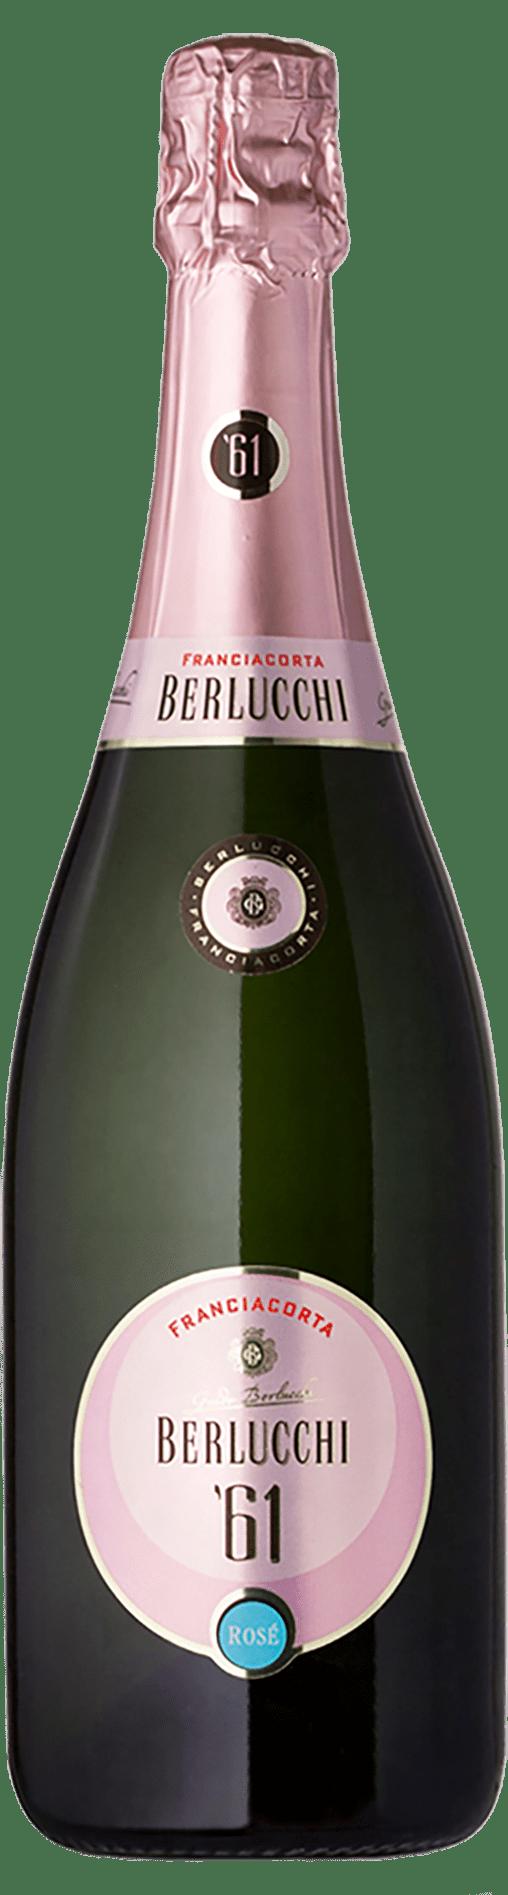 Berlucchi 61' Rosè Franciacorta